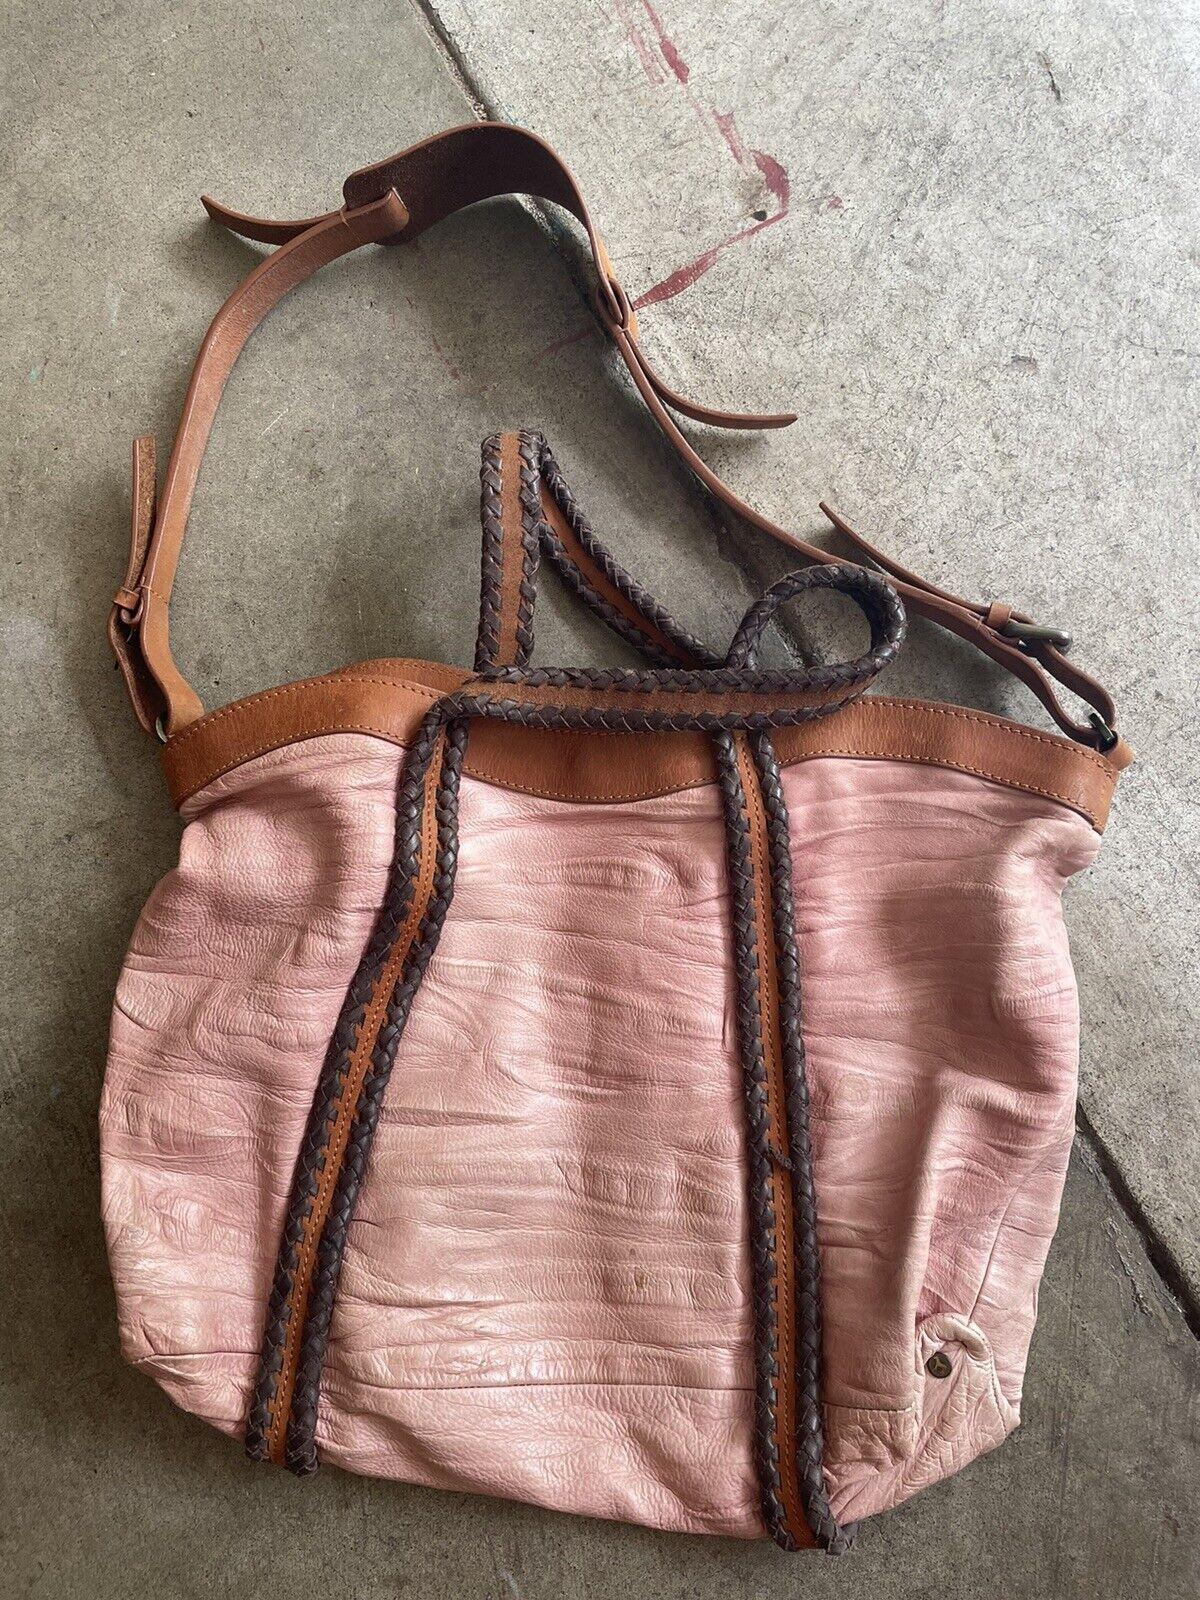 holding horses Leather Dusty Pink bag - image 1